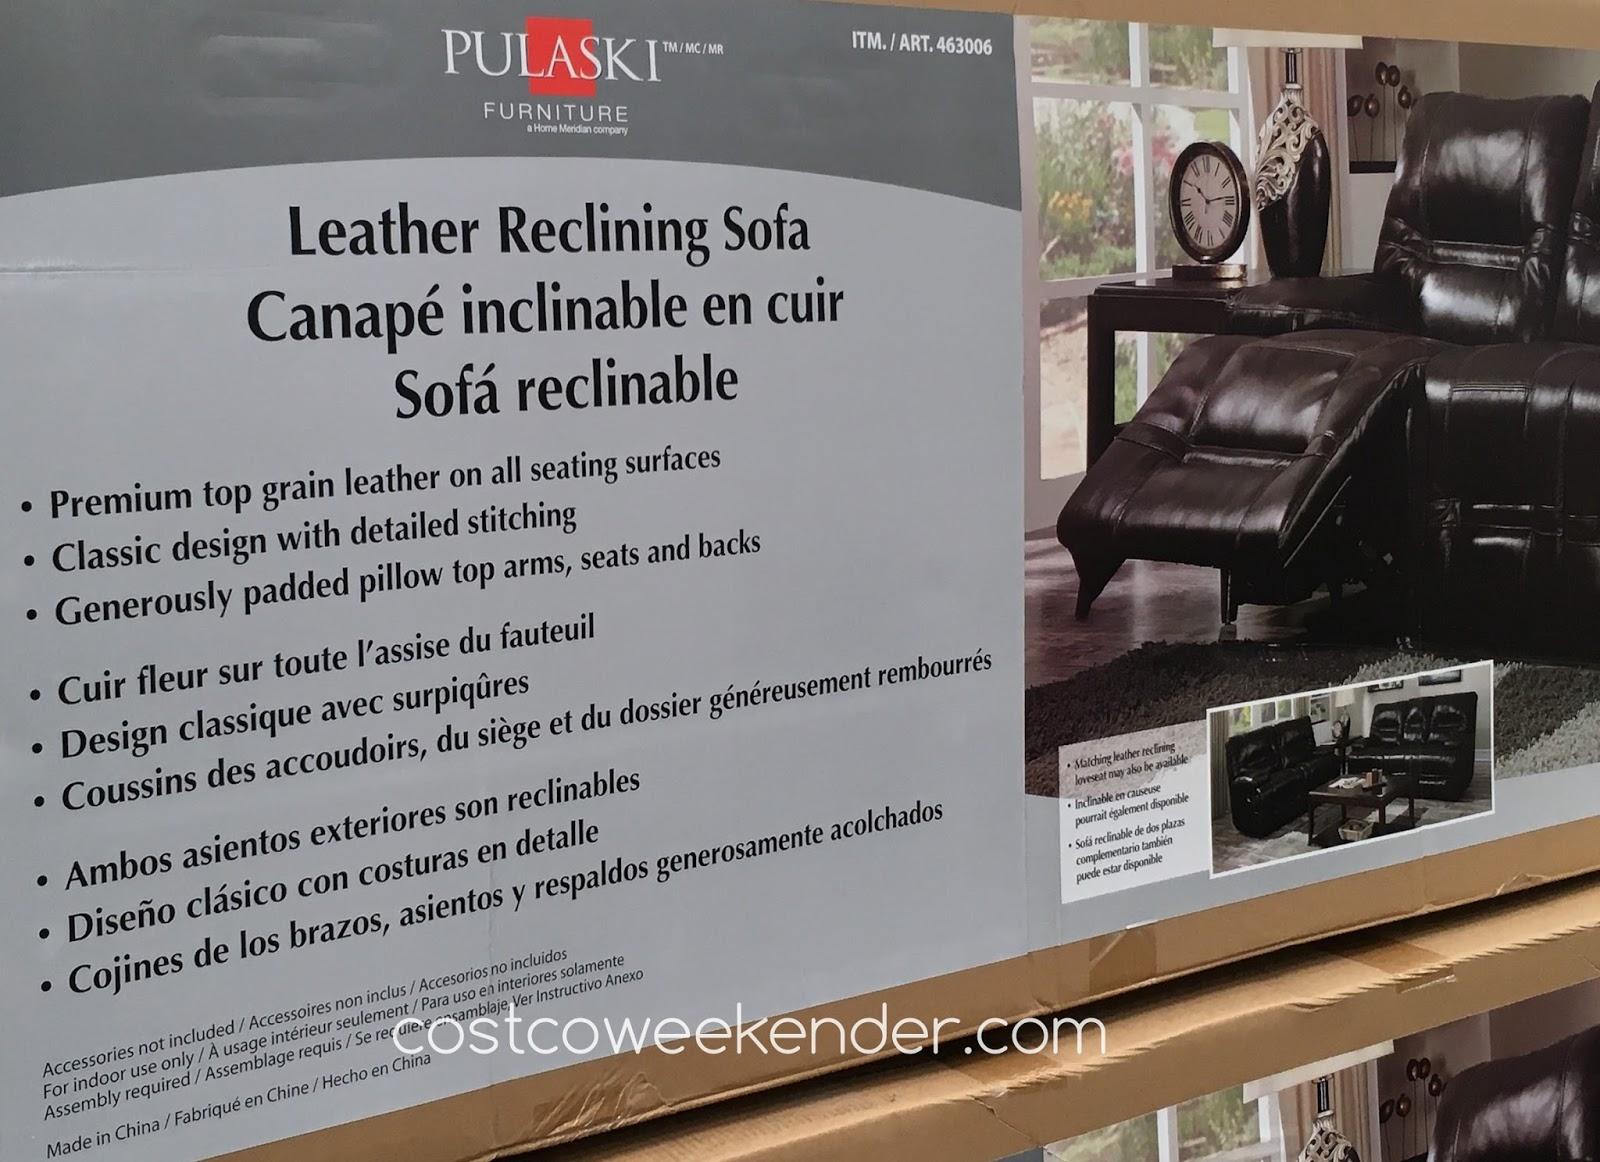 Pulaski Furniture Leather Reclining Sofa